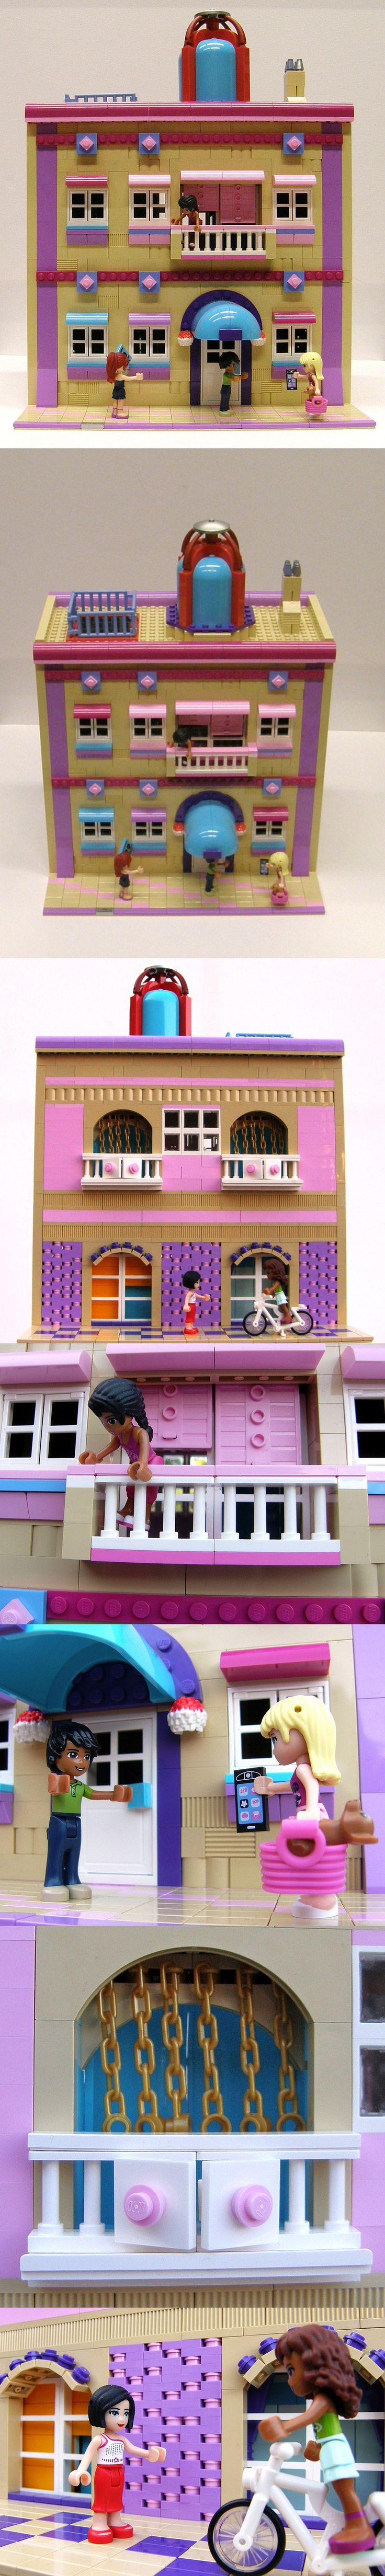 Heartlake Hotel #LEGO #Friends #Hotel #Heartlake